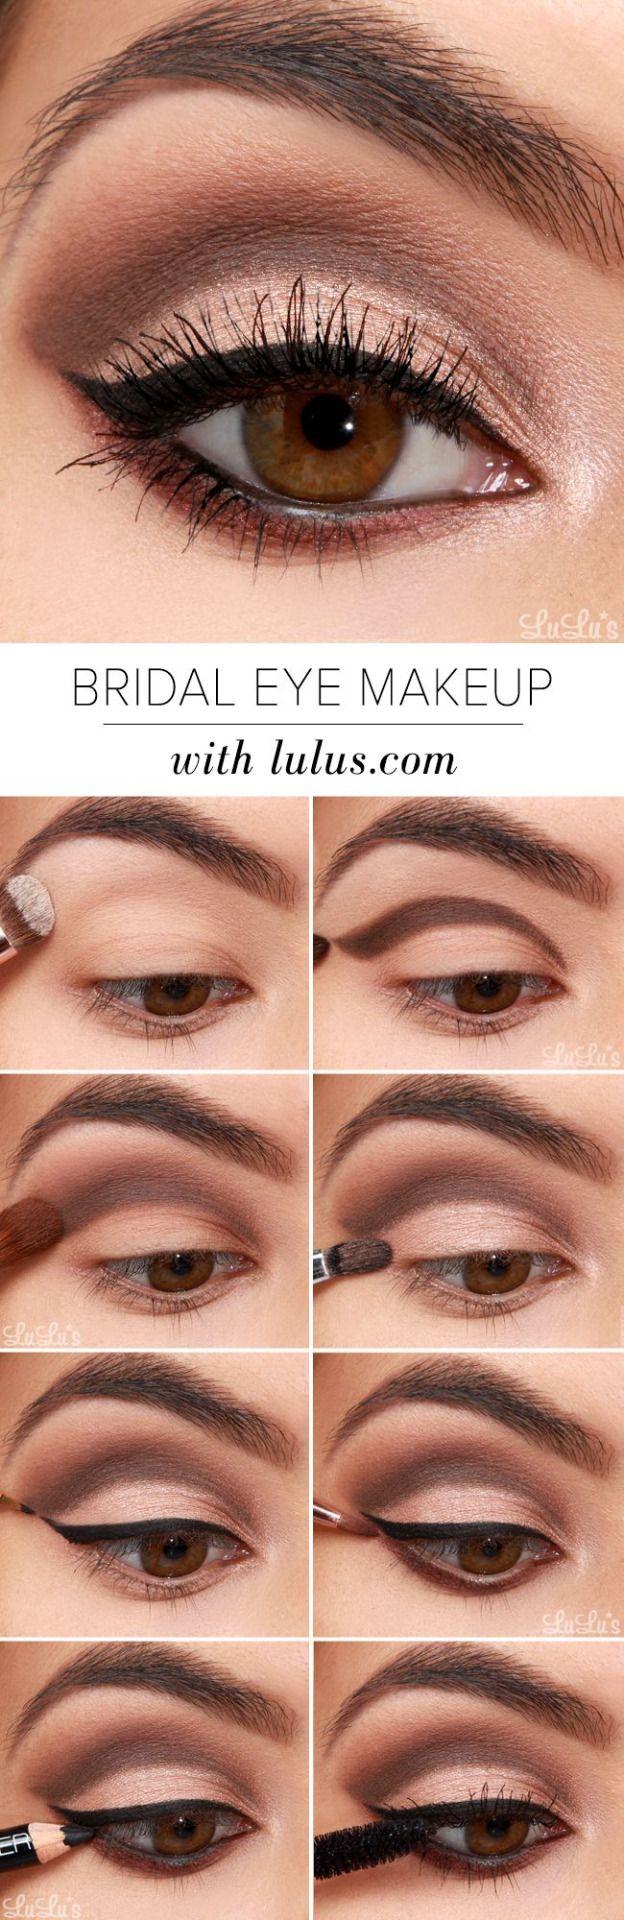 Makeup Fans - WE HEART IT: How-to Bridal Eye Makeup Tutorial